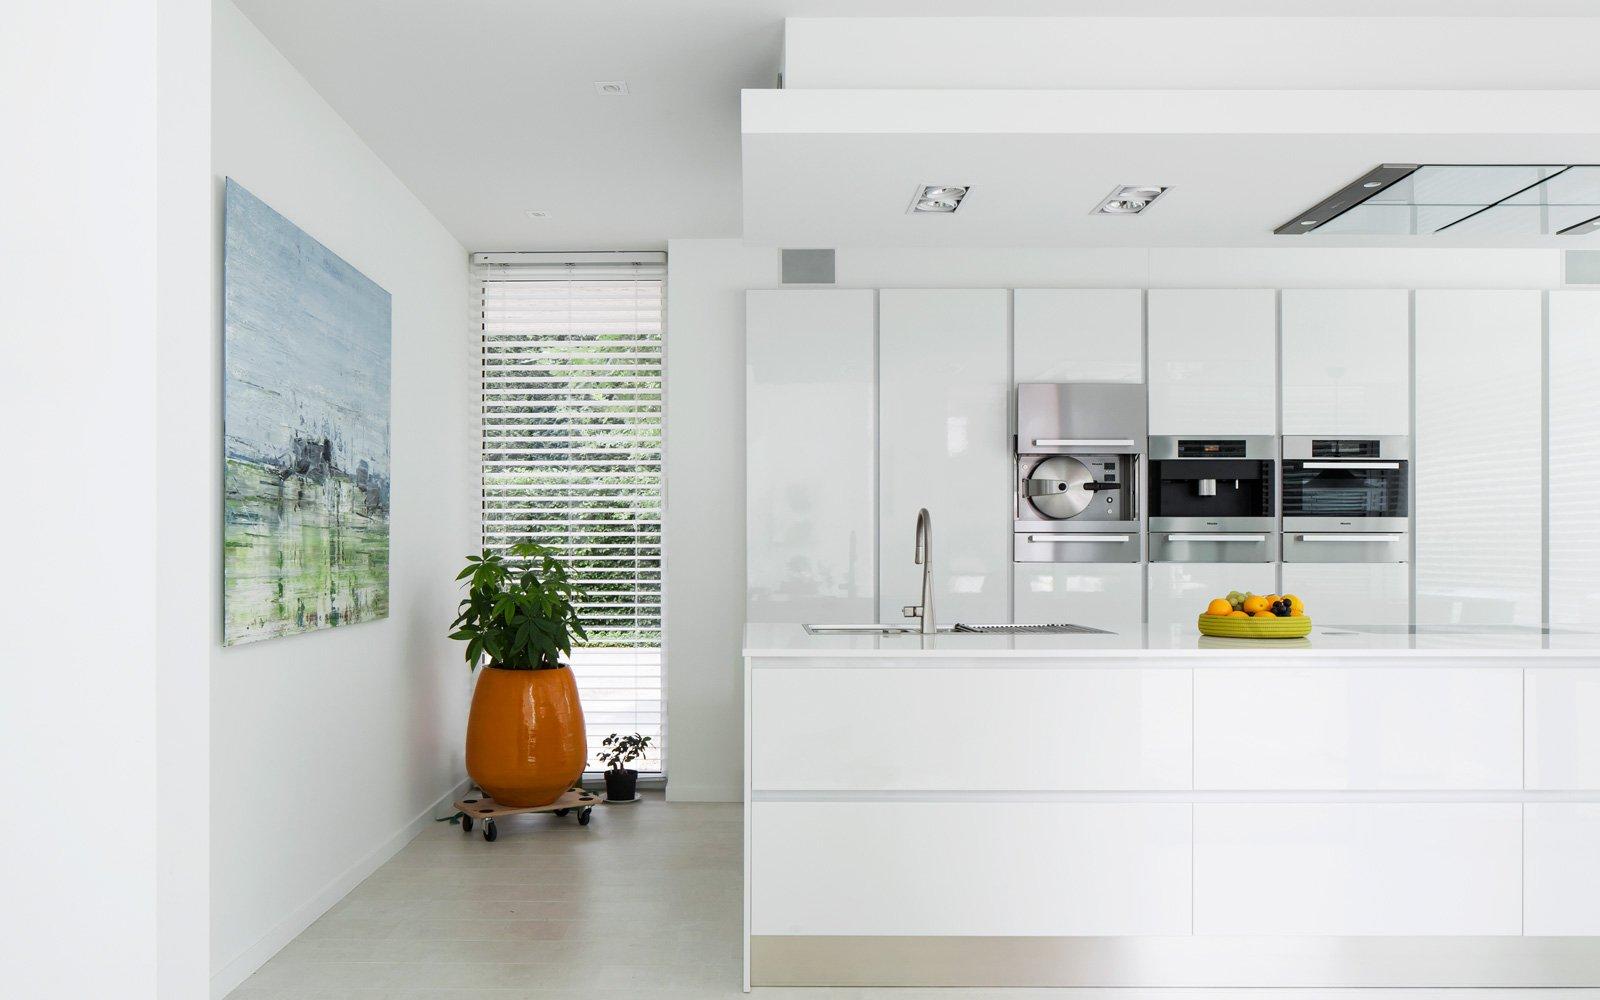 Strak & modern schellen architecten the art of living be